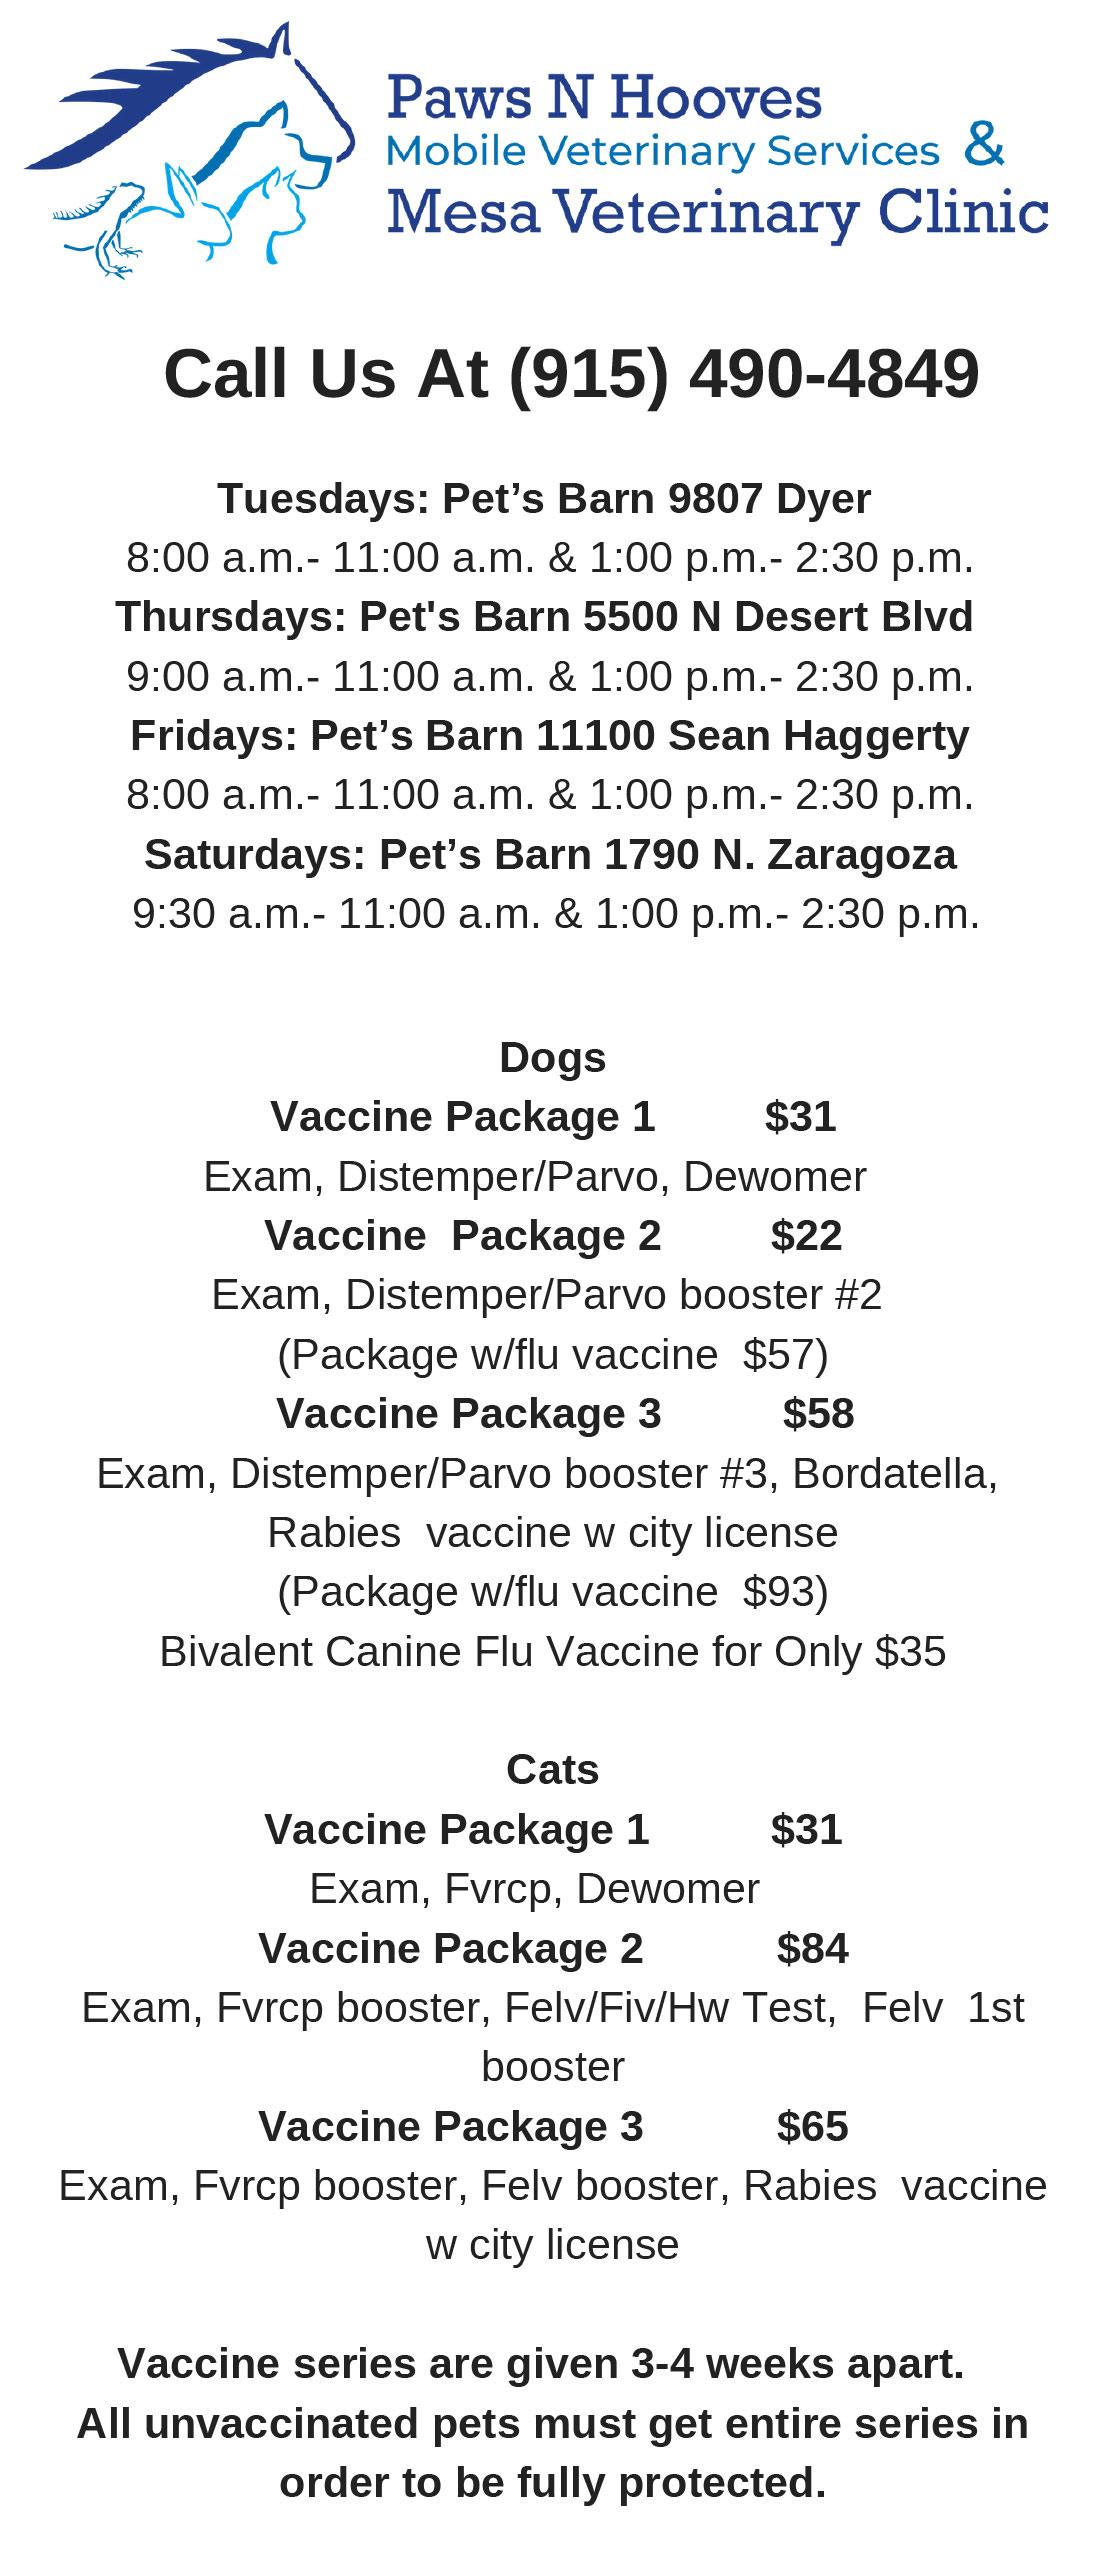 mobile location \u0026 mobile pricing mesa veterinary clinic \u0026 paws n